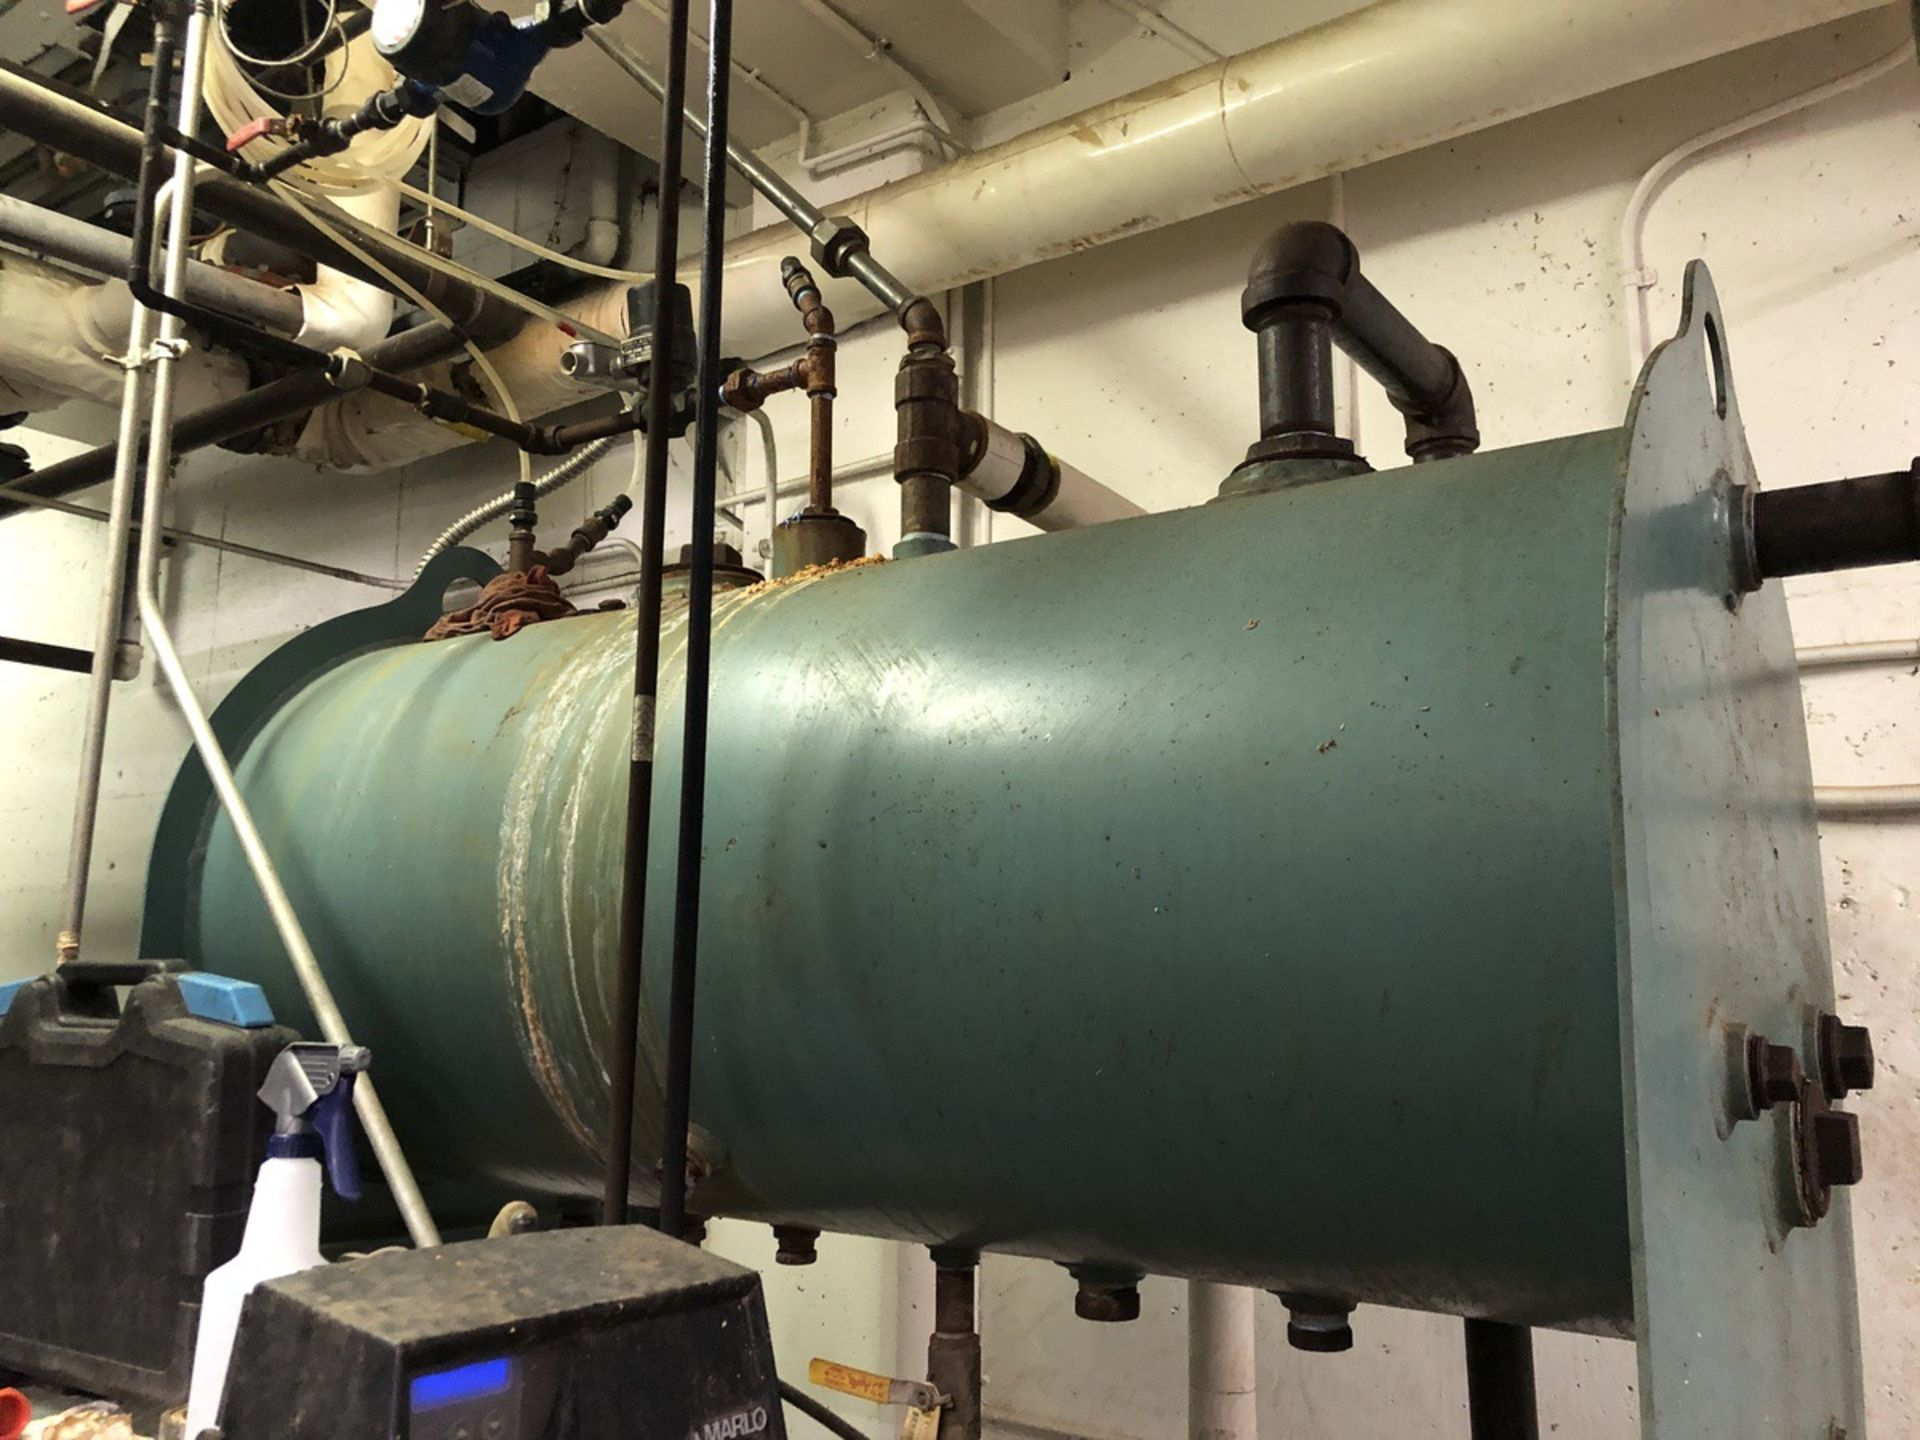 Lot 36 - 2013 Cleaver Brooks Model FLX-700-400-150ST Boiler, S/N: 07162-1-1   Rig Fee: $1500